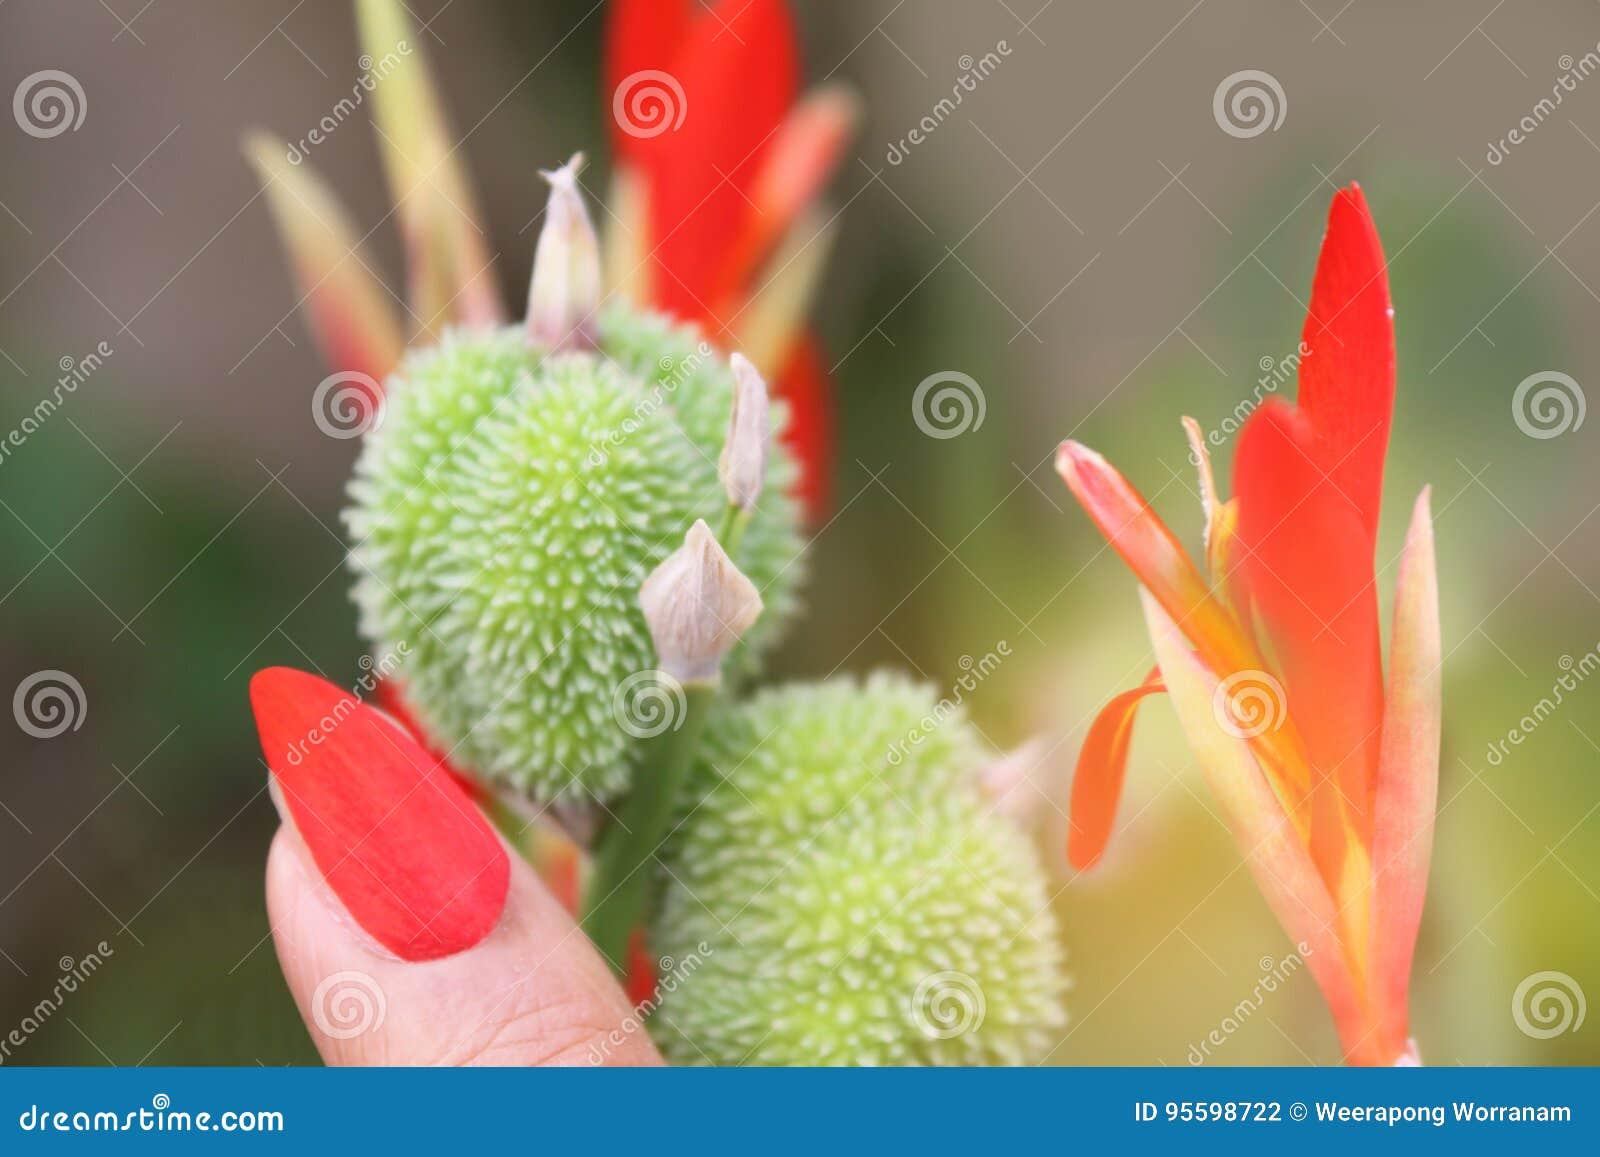 Lujoso Flor De Lis De Uñas Imagen - Ideas Para Pintar Uñas - knxc.info